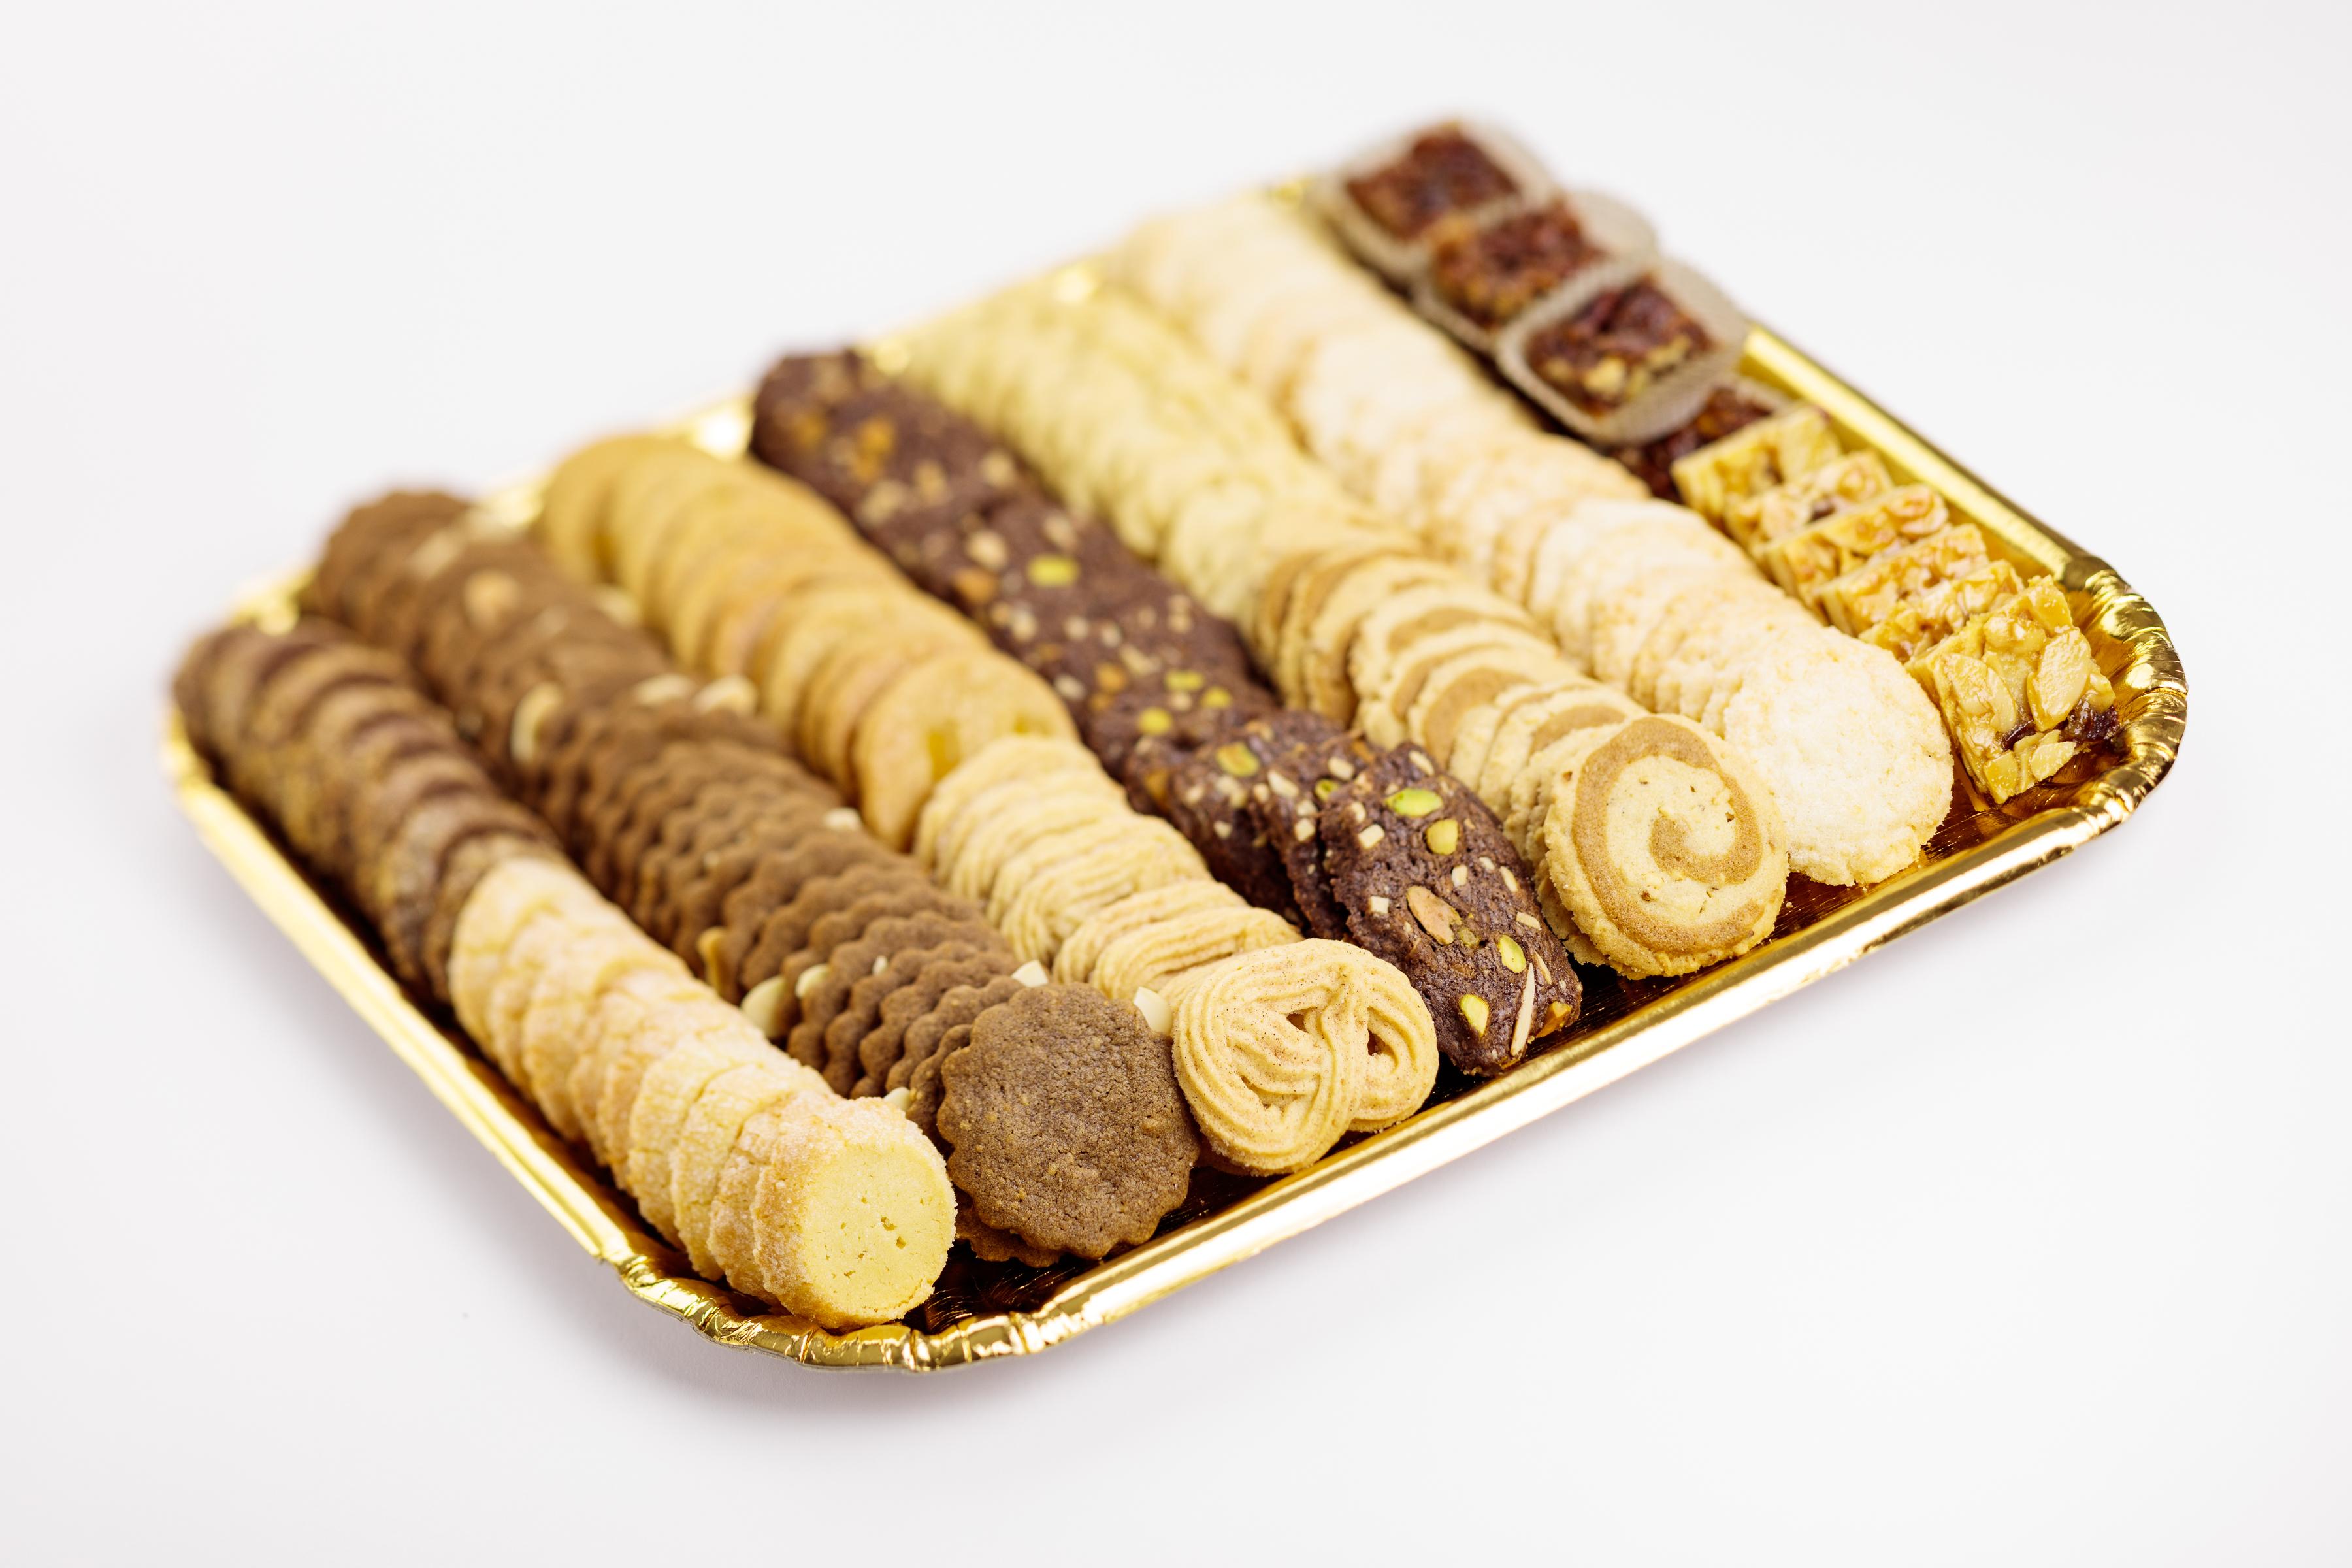 Large Cookie Platter